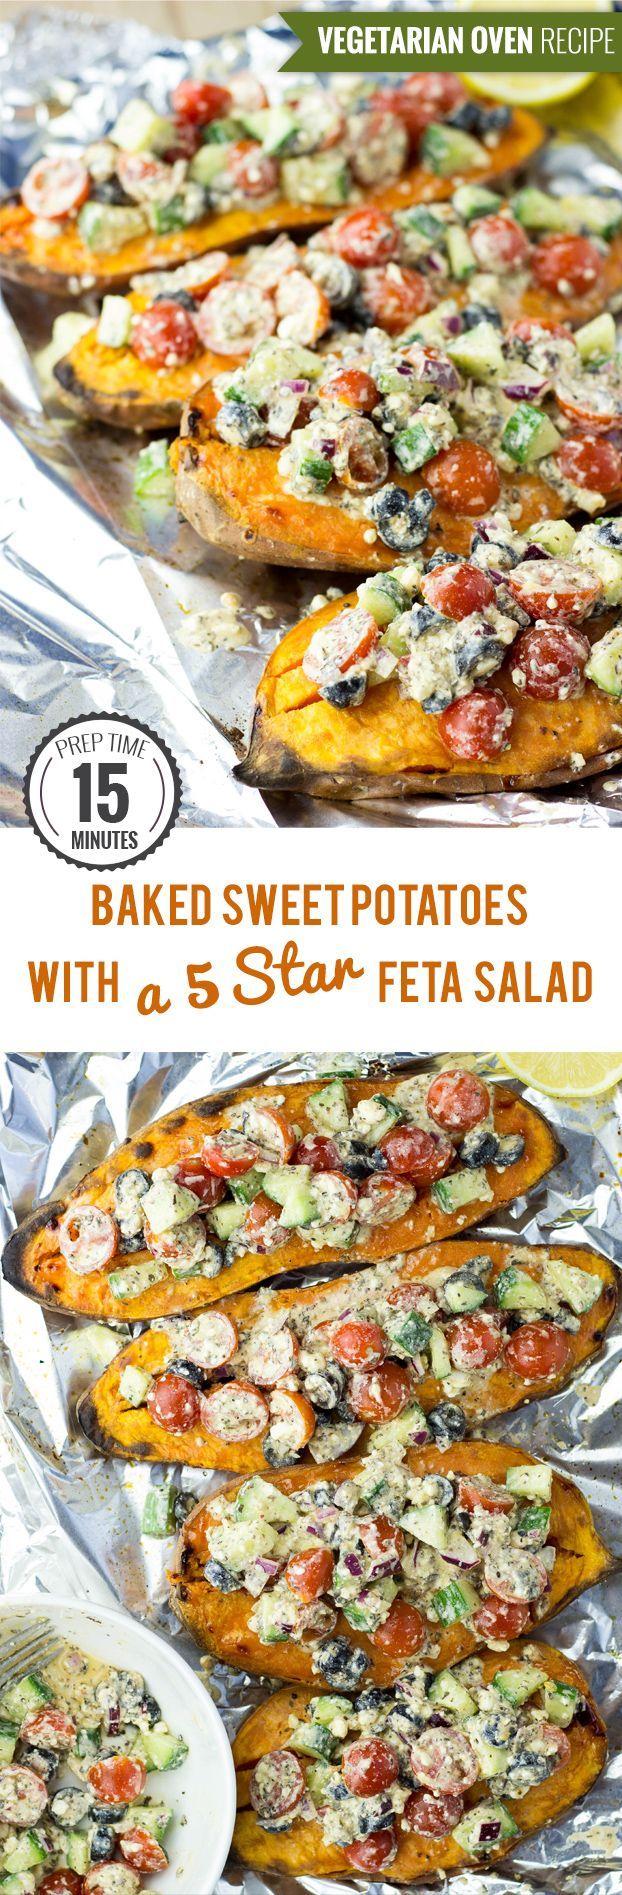 Baked Sweet Potatoes with a Five Star Feta Salad #sweetpotatoes #baked #feta | hurrythefoodup.com